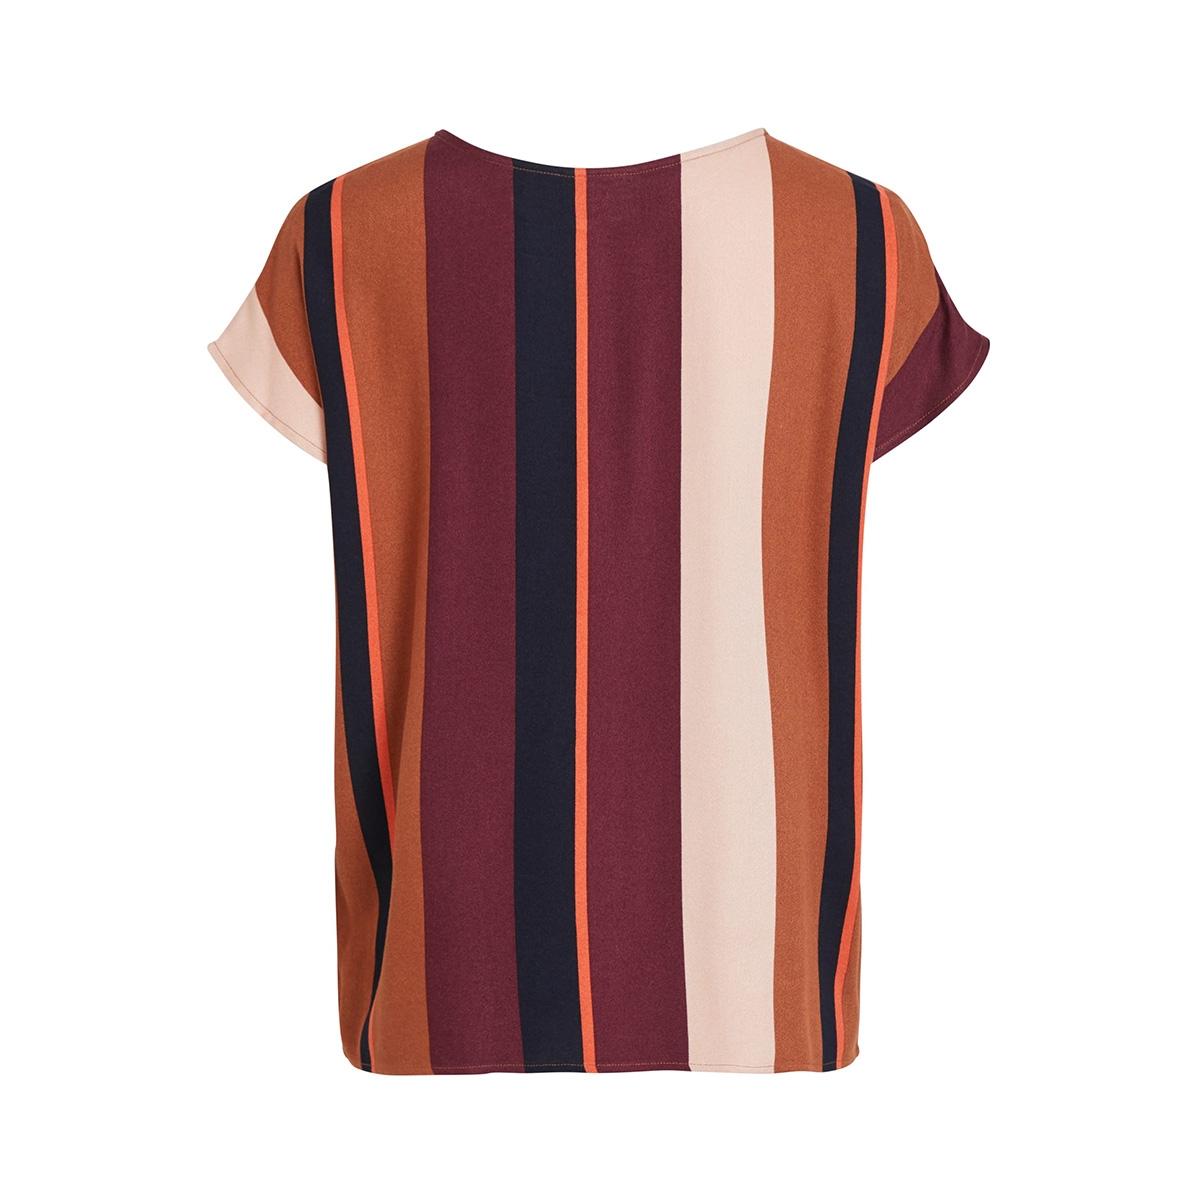 objesme urban s/s top 105 div 23031599 object t-shirt brown patina/striped